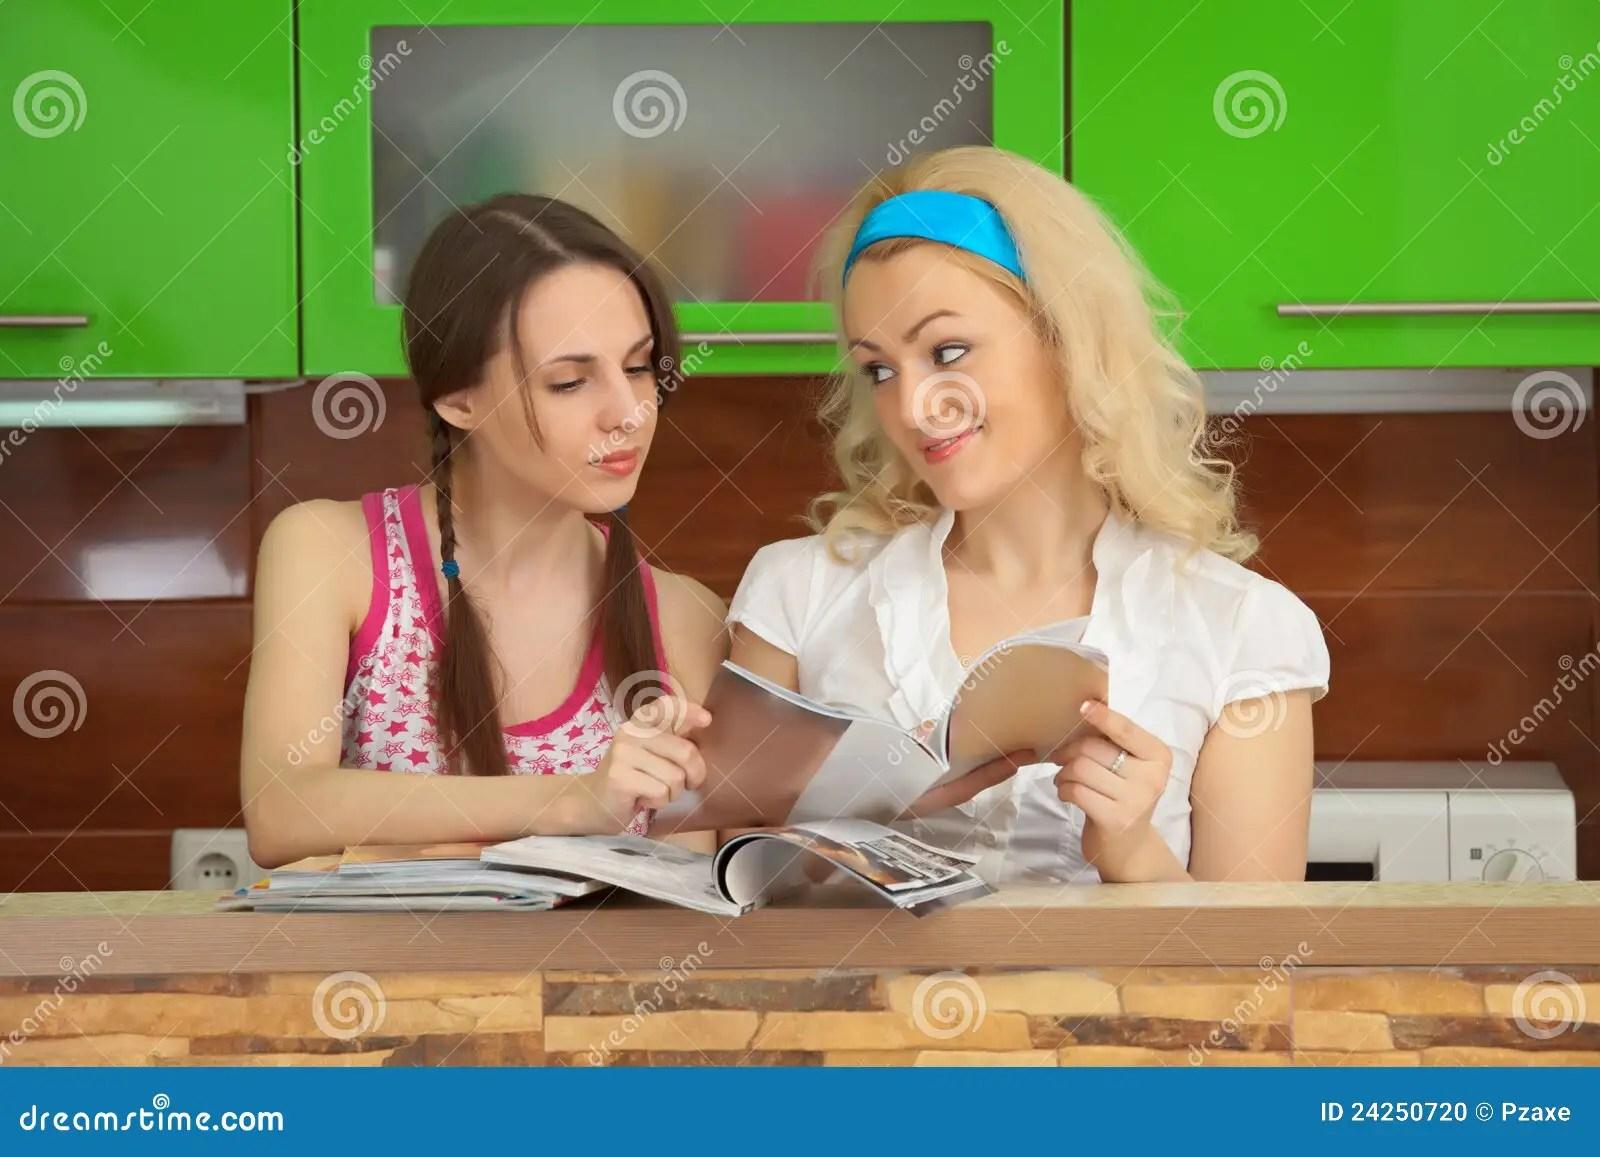 kitchen magazines cabinet set 女朋友厨房杂志s二妇女库存照片 图片包括有空白 手表 相当 乐趣 女朋友厨房叶子杂志s二妇女